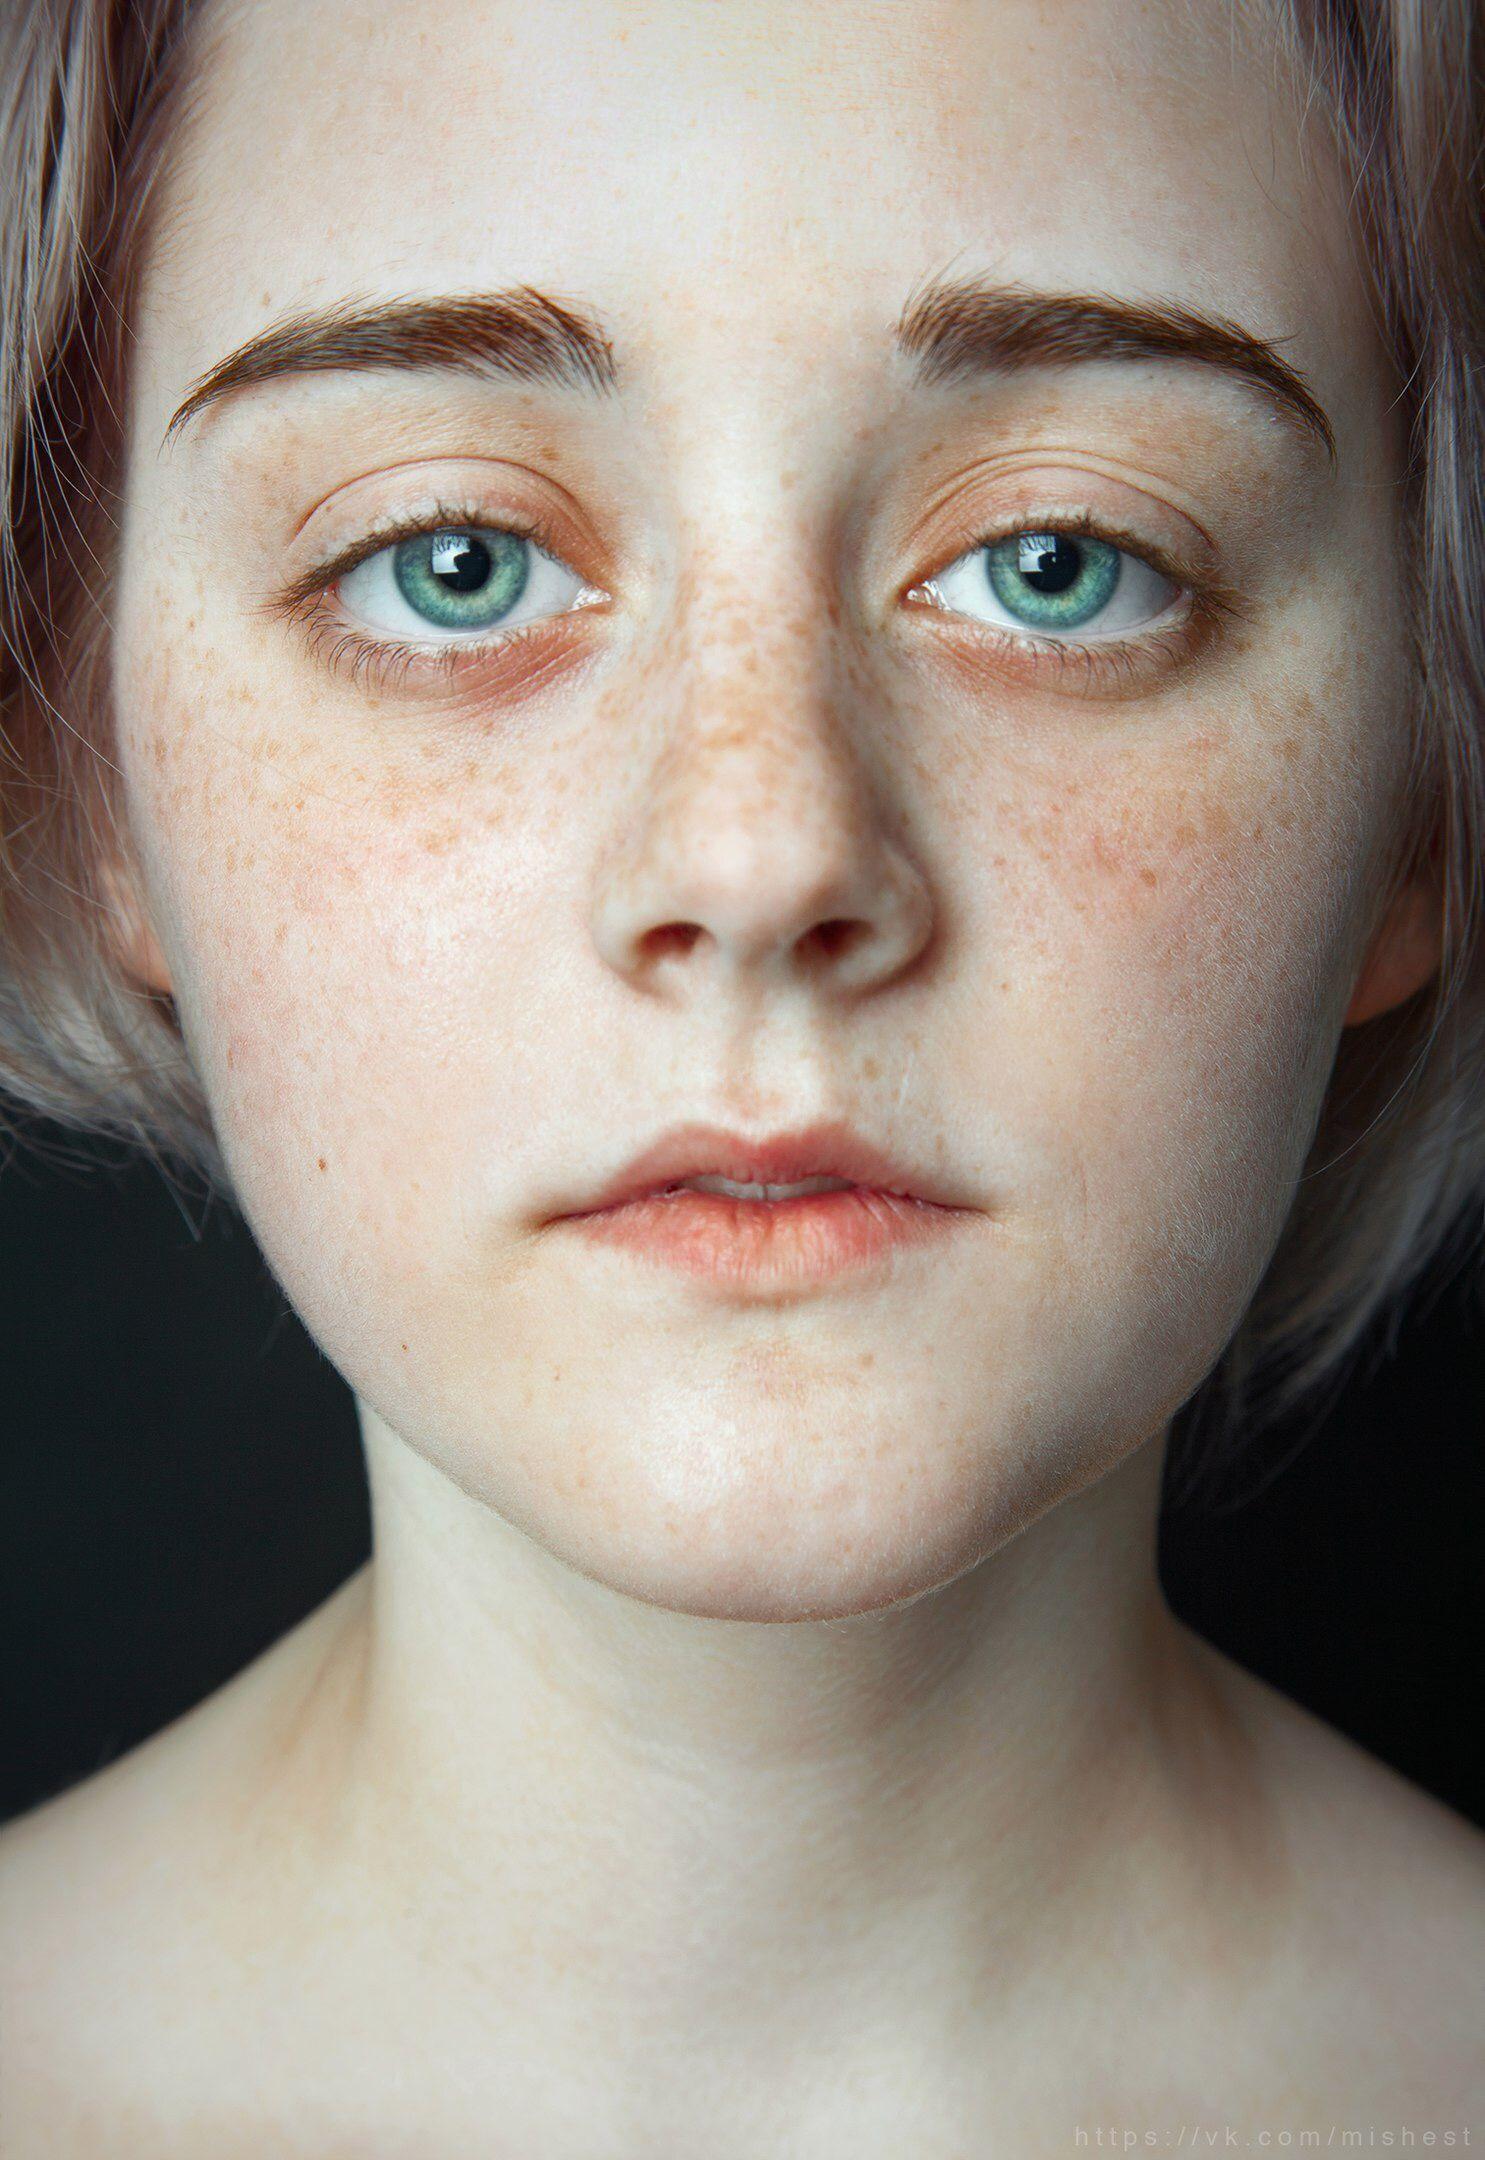 Avira woman face girl face portrait inspiration character inspiration human reference